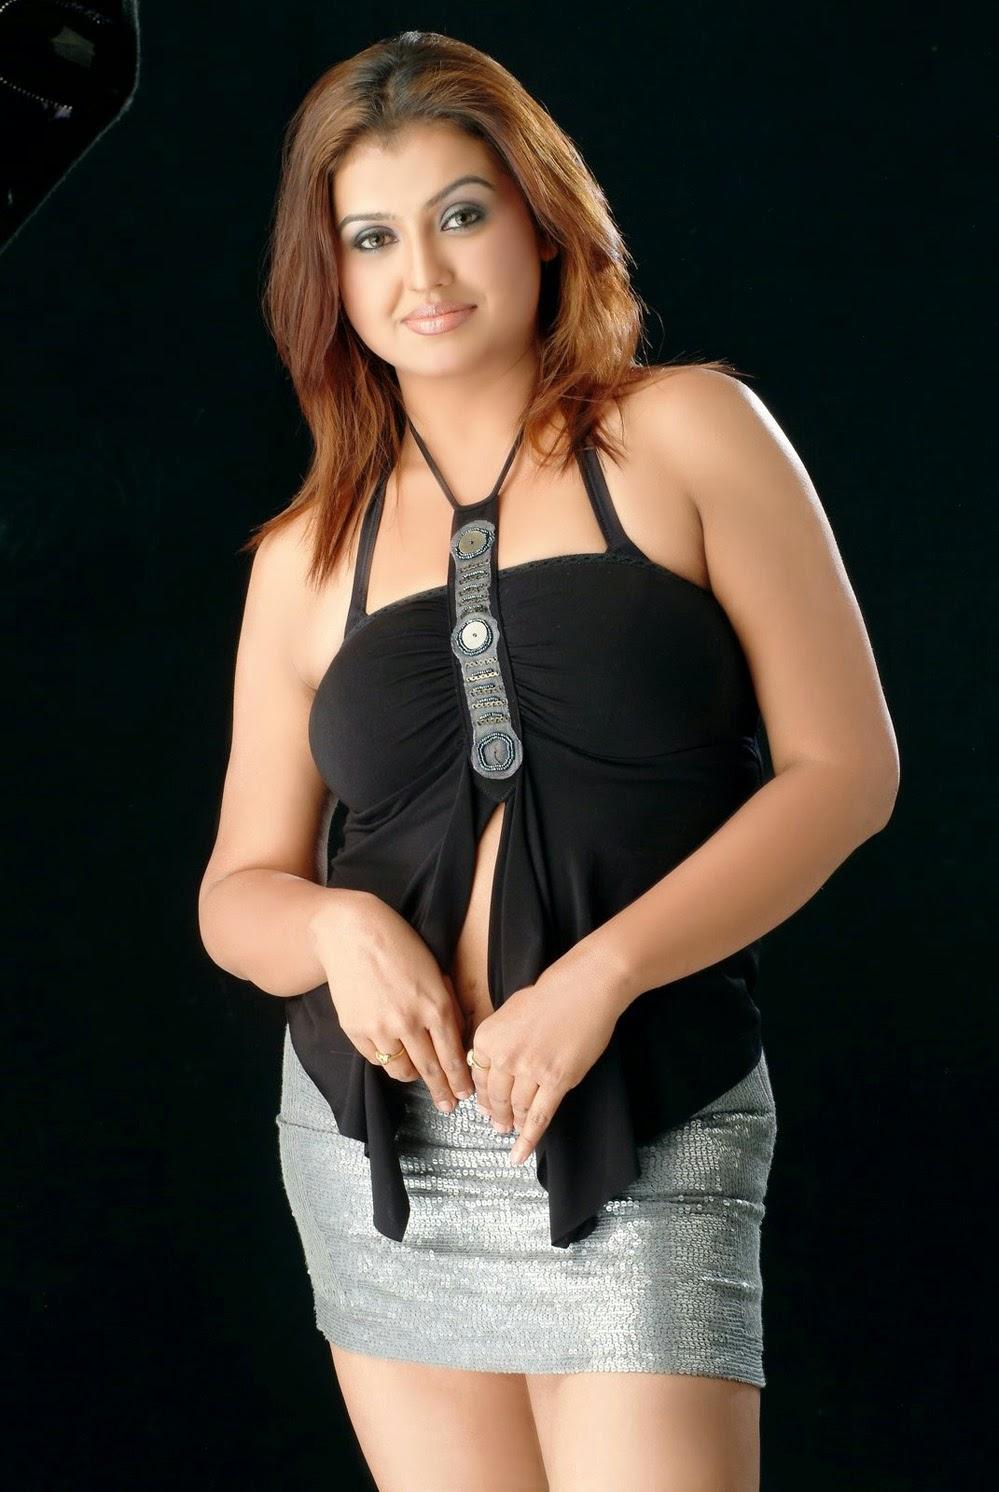 Pakistani Xnxx Desi Bhabhi Hot Nude Photo Album Masala -4302